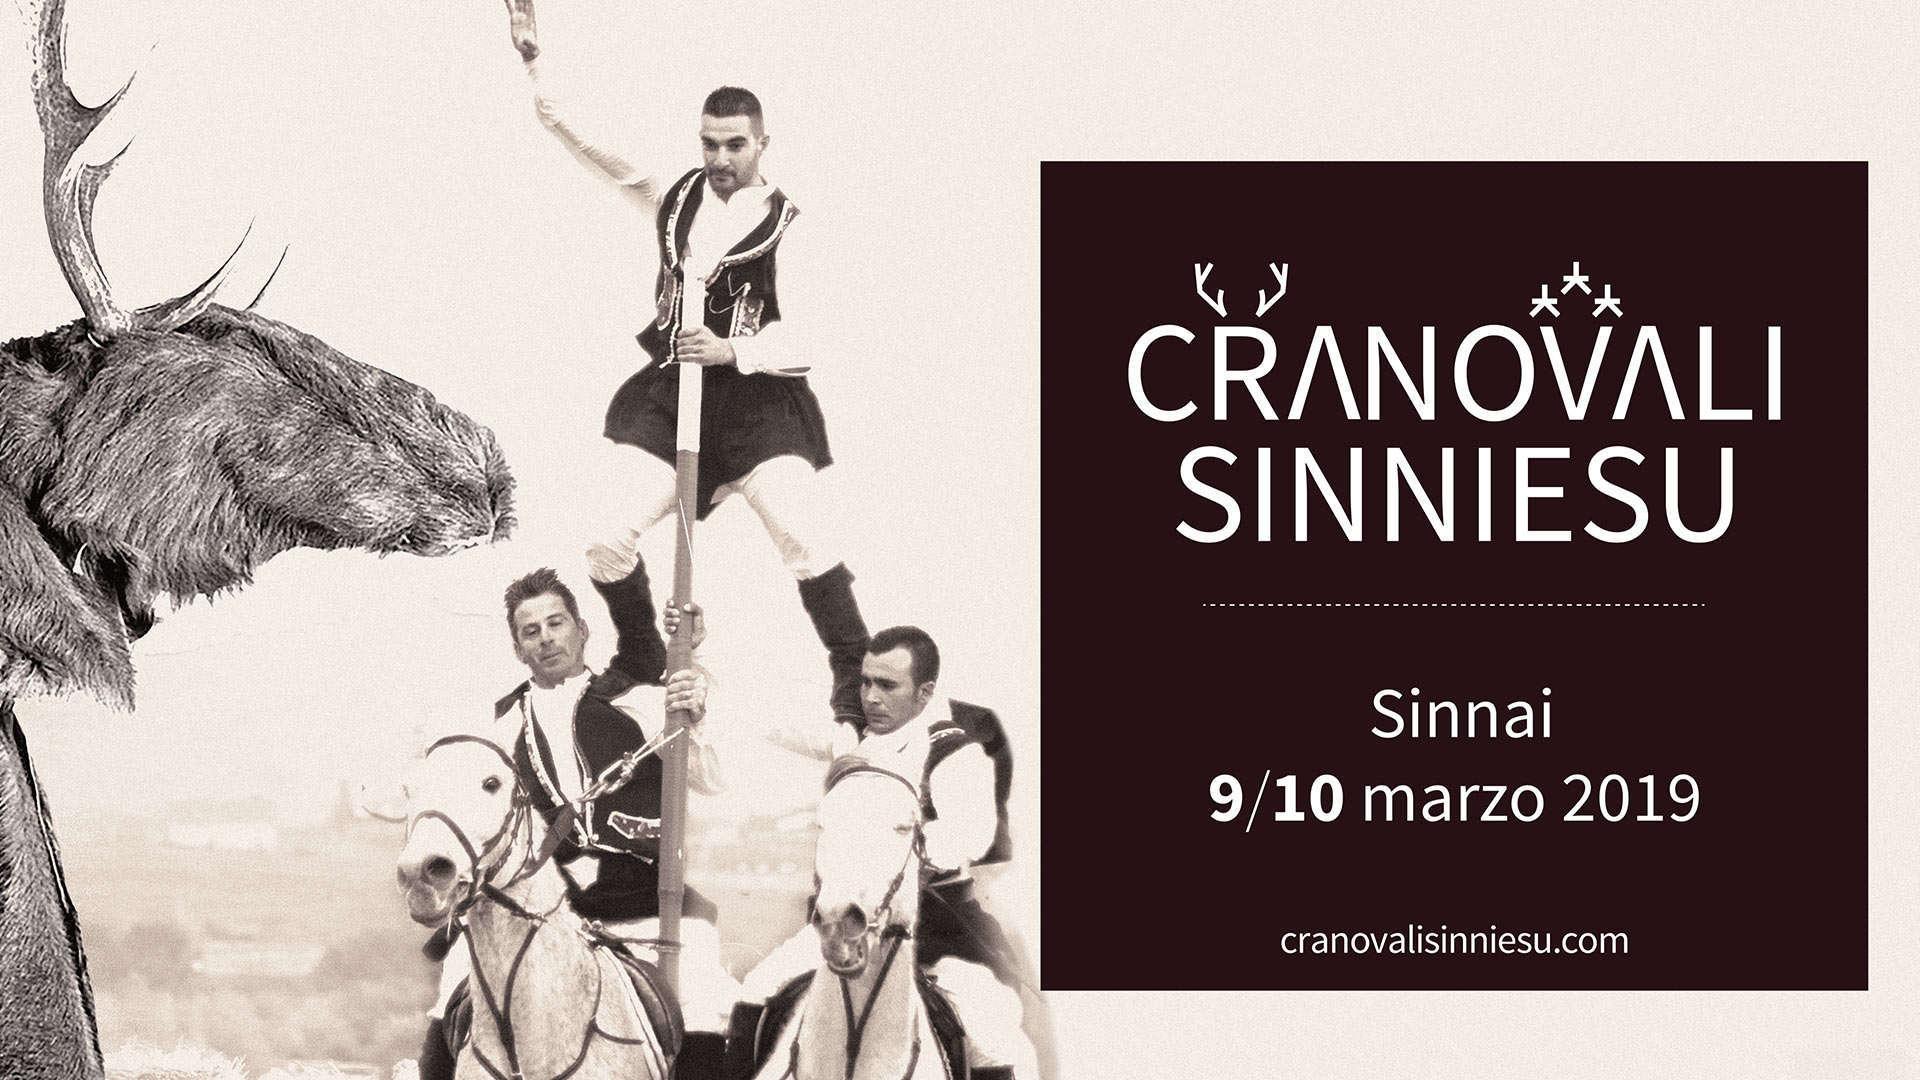 Comune di Sinnai - Cranovali Sinniesu 2019